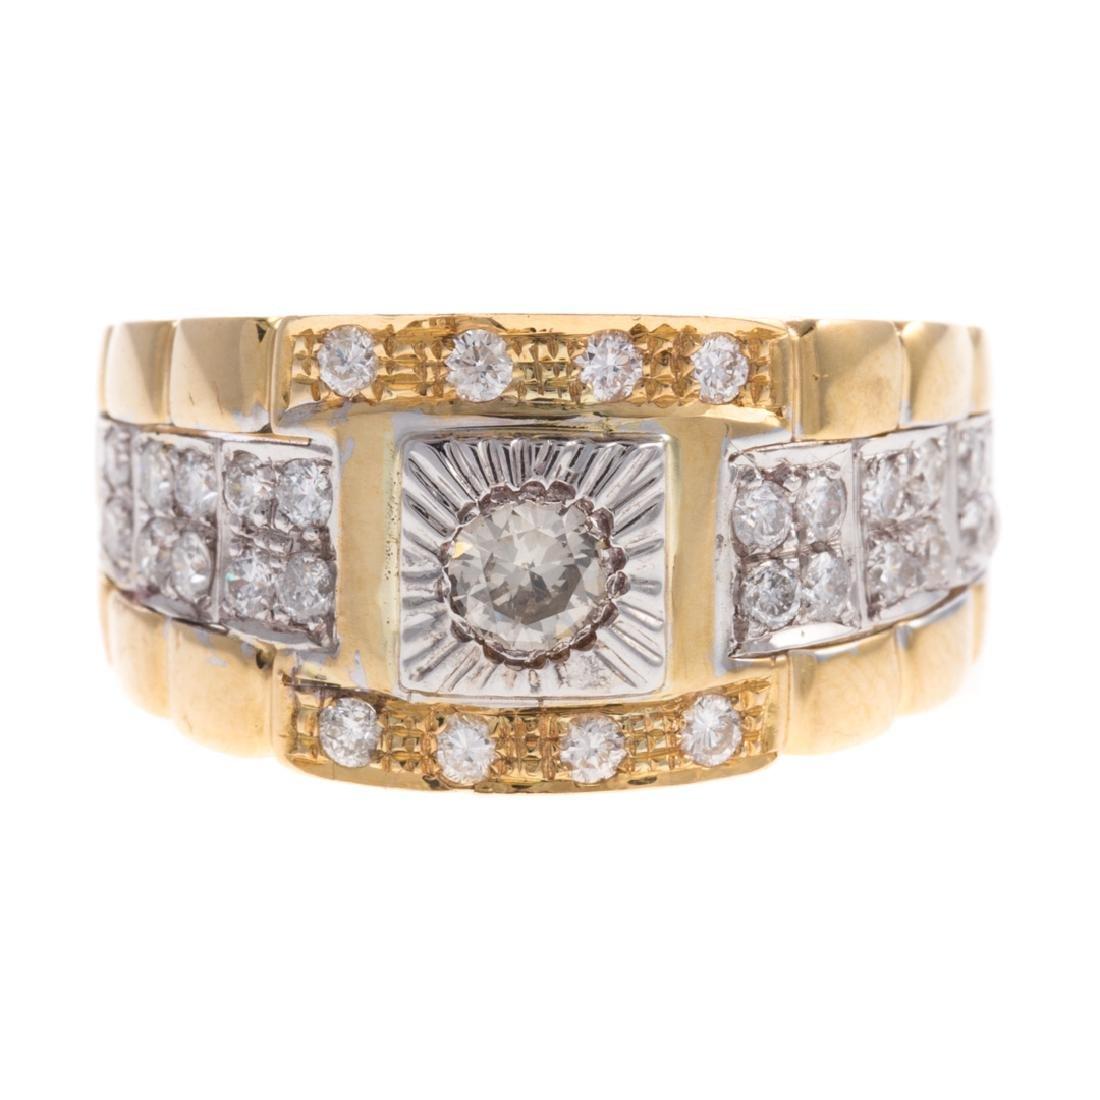 A Gentlemen's Diamond Ring in 18K Gold